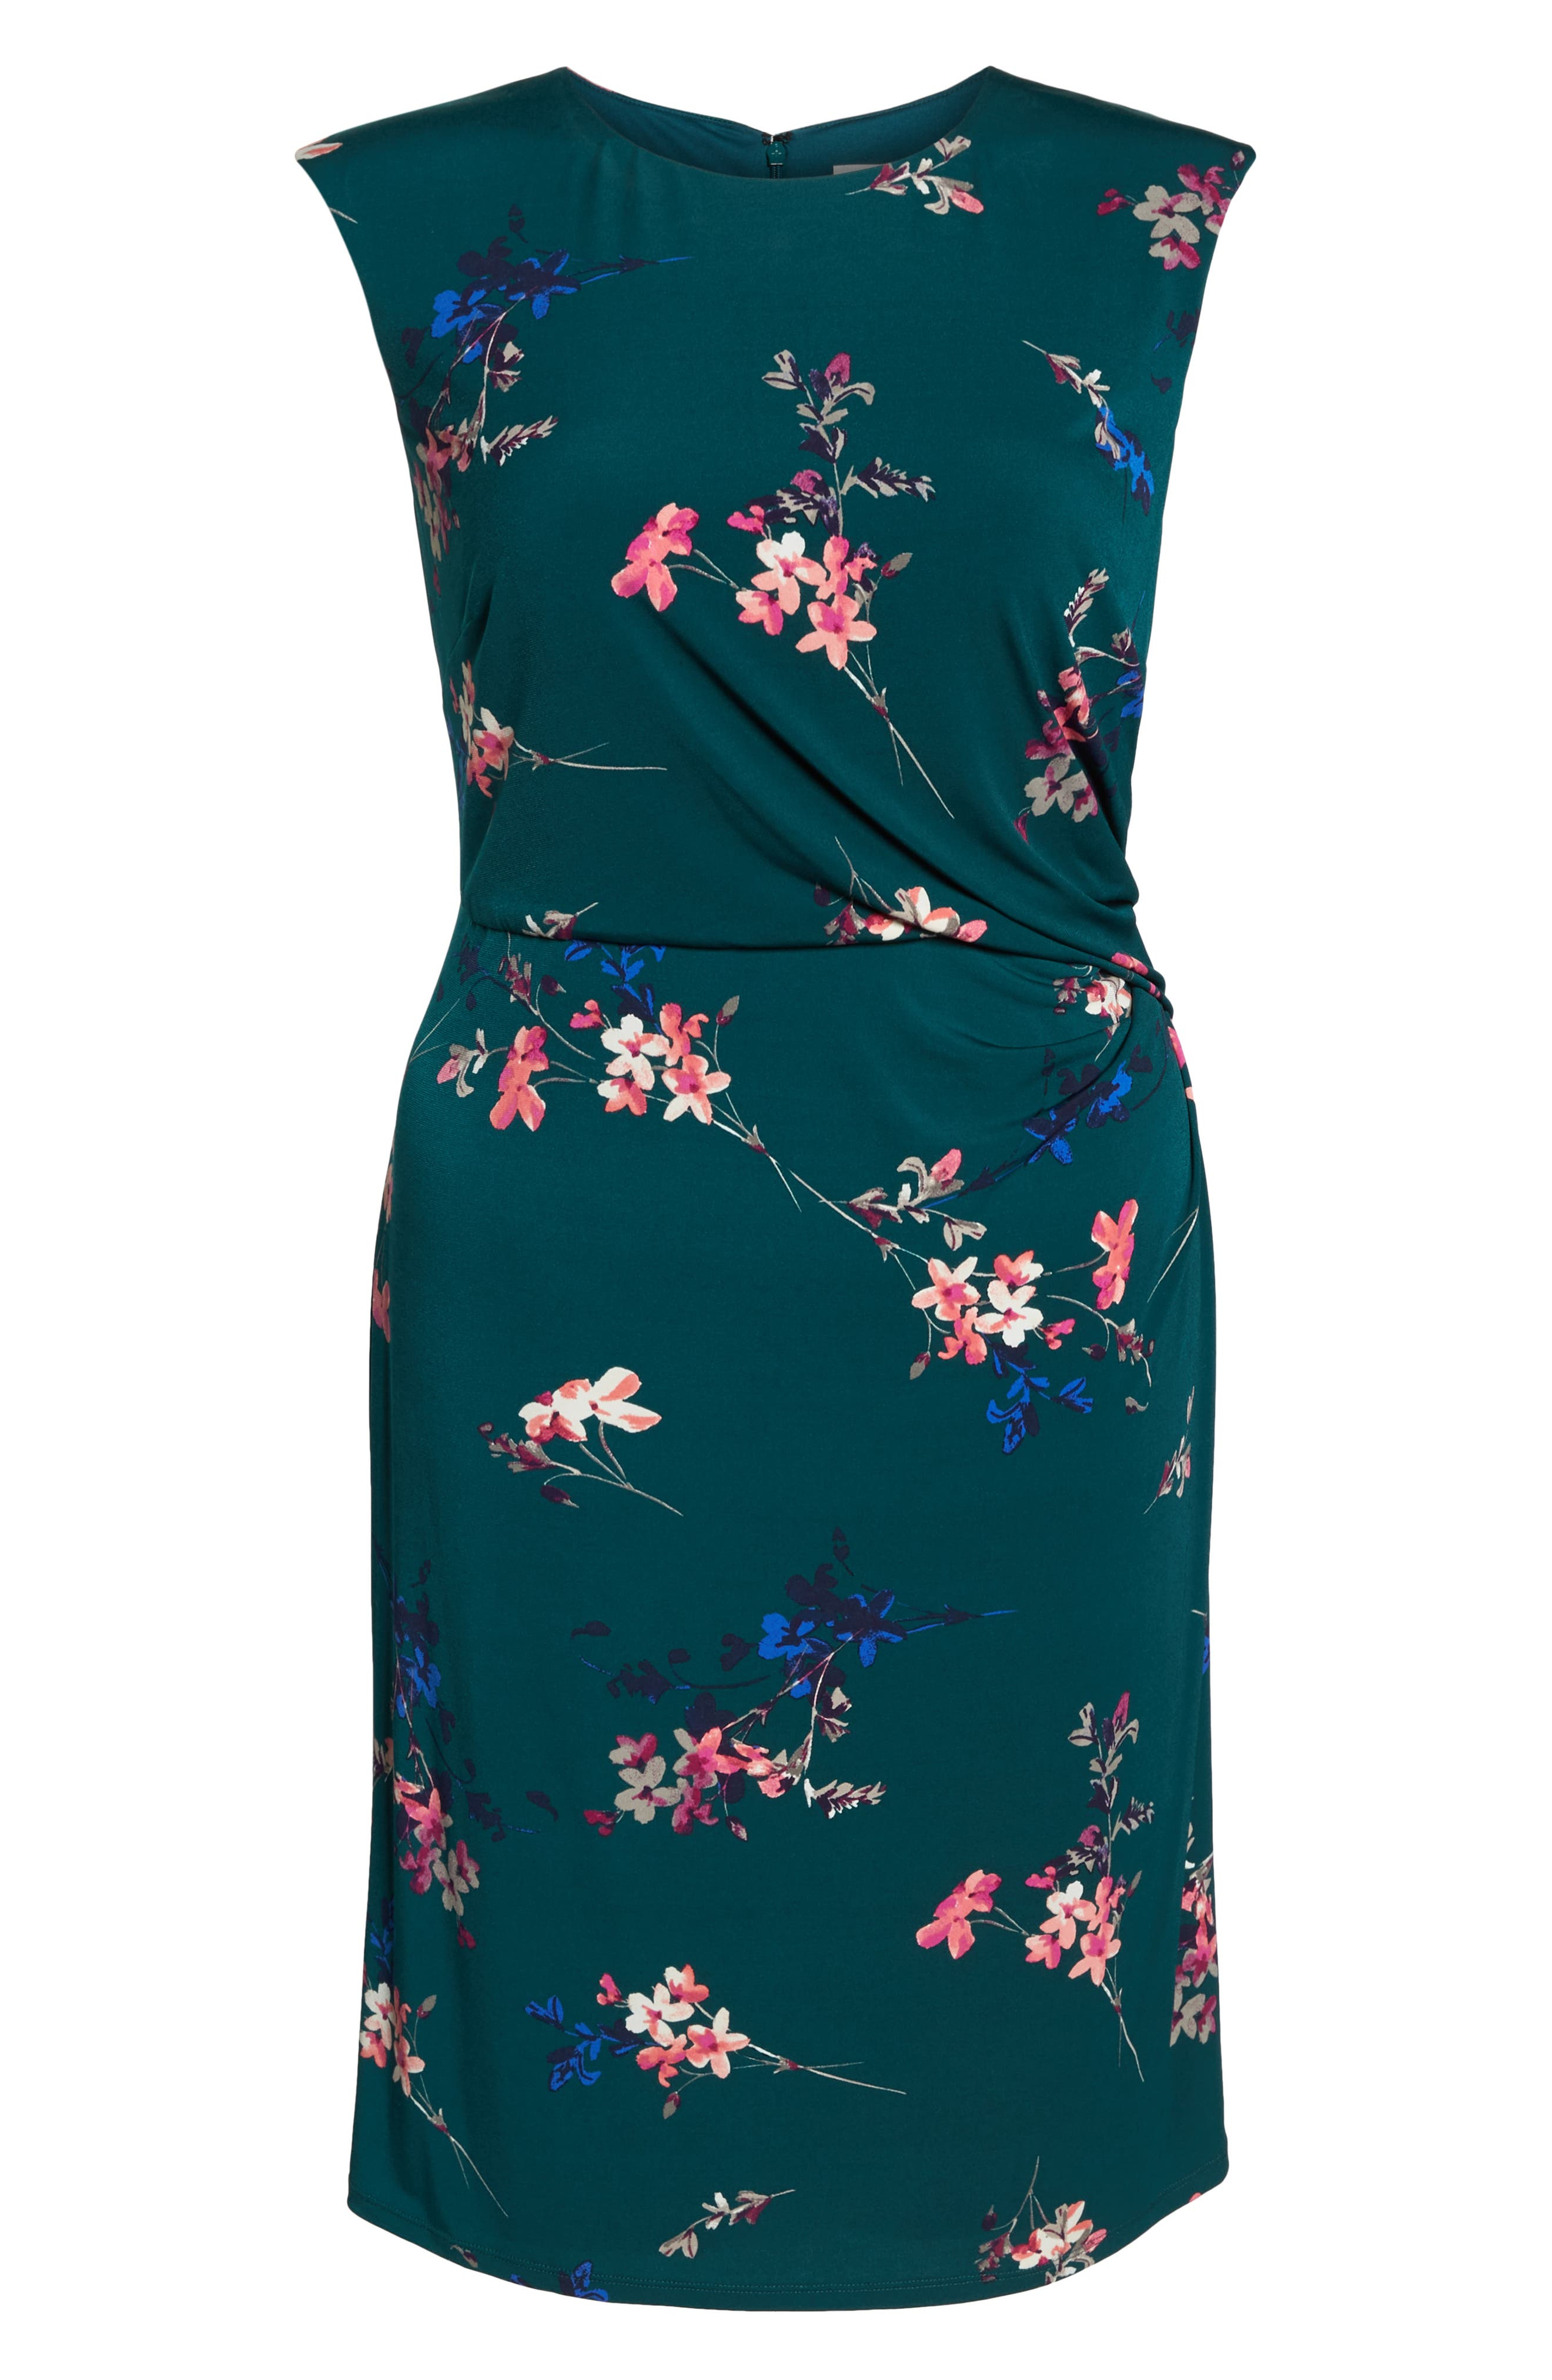 ELIZA J, Floral Print Cap Sleeve Sheath Dress, Alternate thumbnail 7, color, GREEN